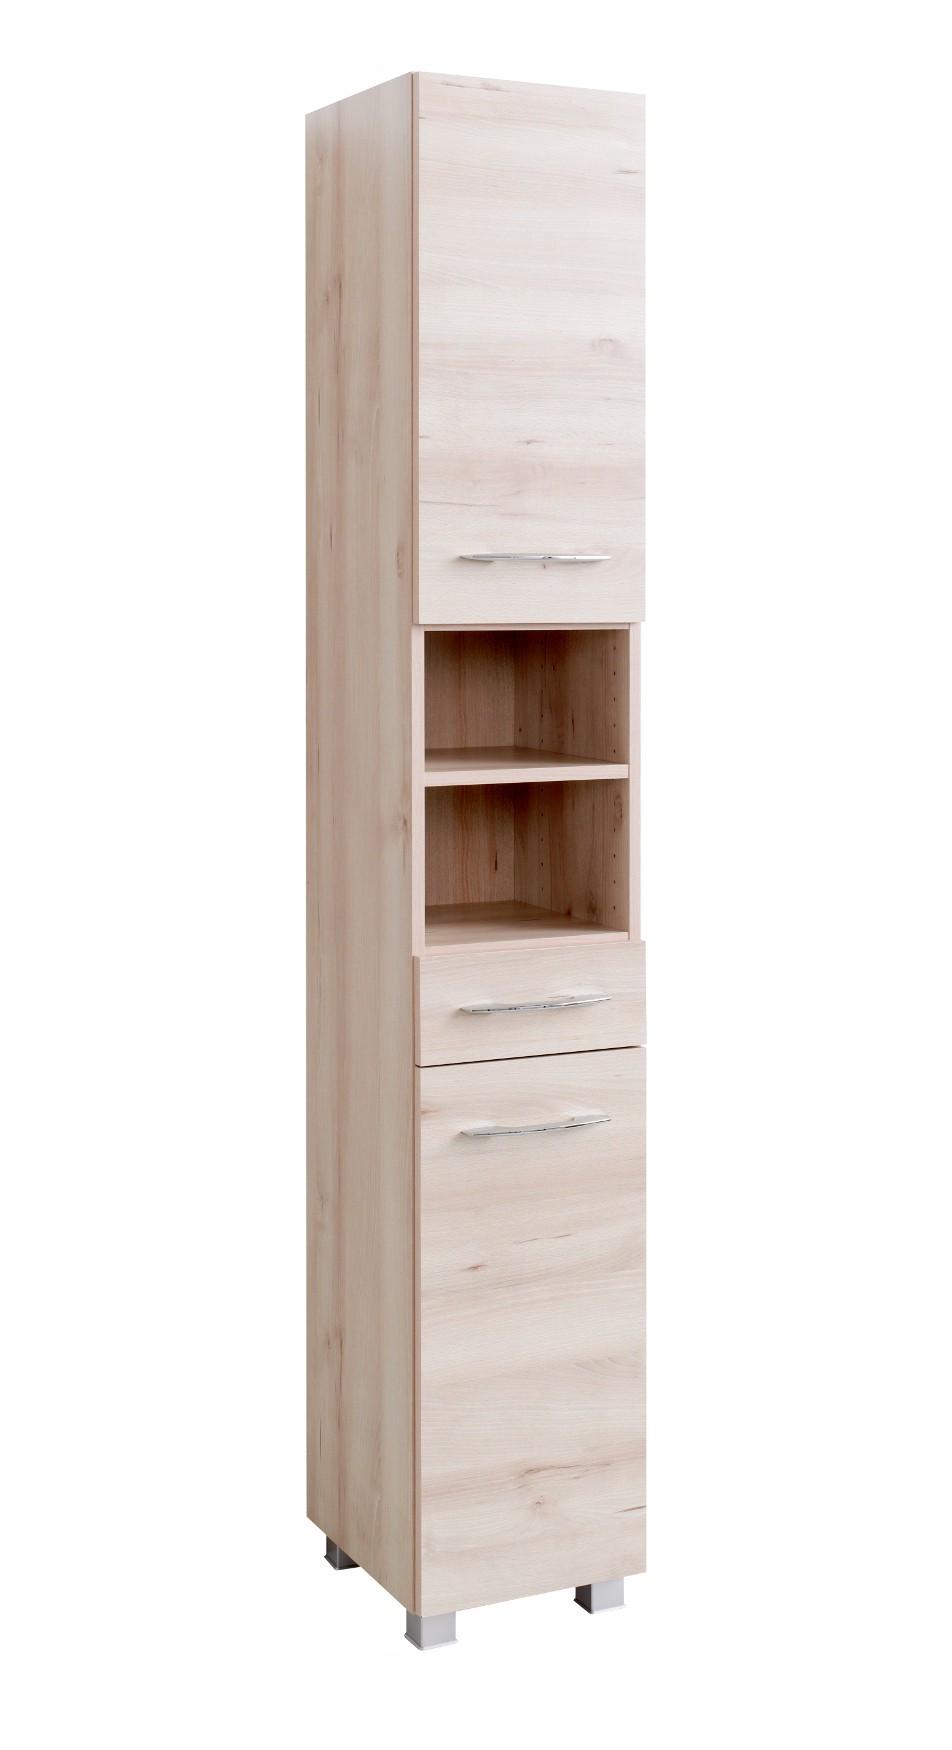 bad hochschrank portofino 2 t rig 1 schubkasten 30 cm breit buche iconic bad portofino. Black Bedroom Furniture Sets. Home Design Ideas